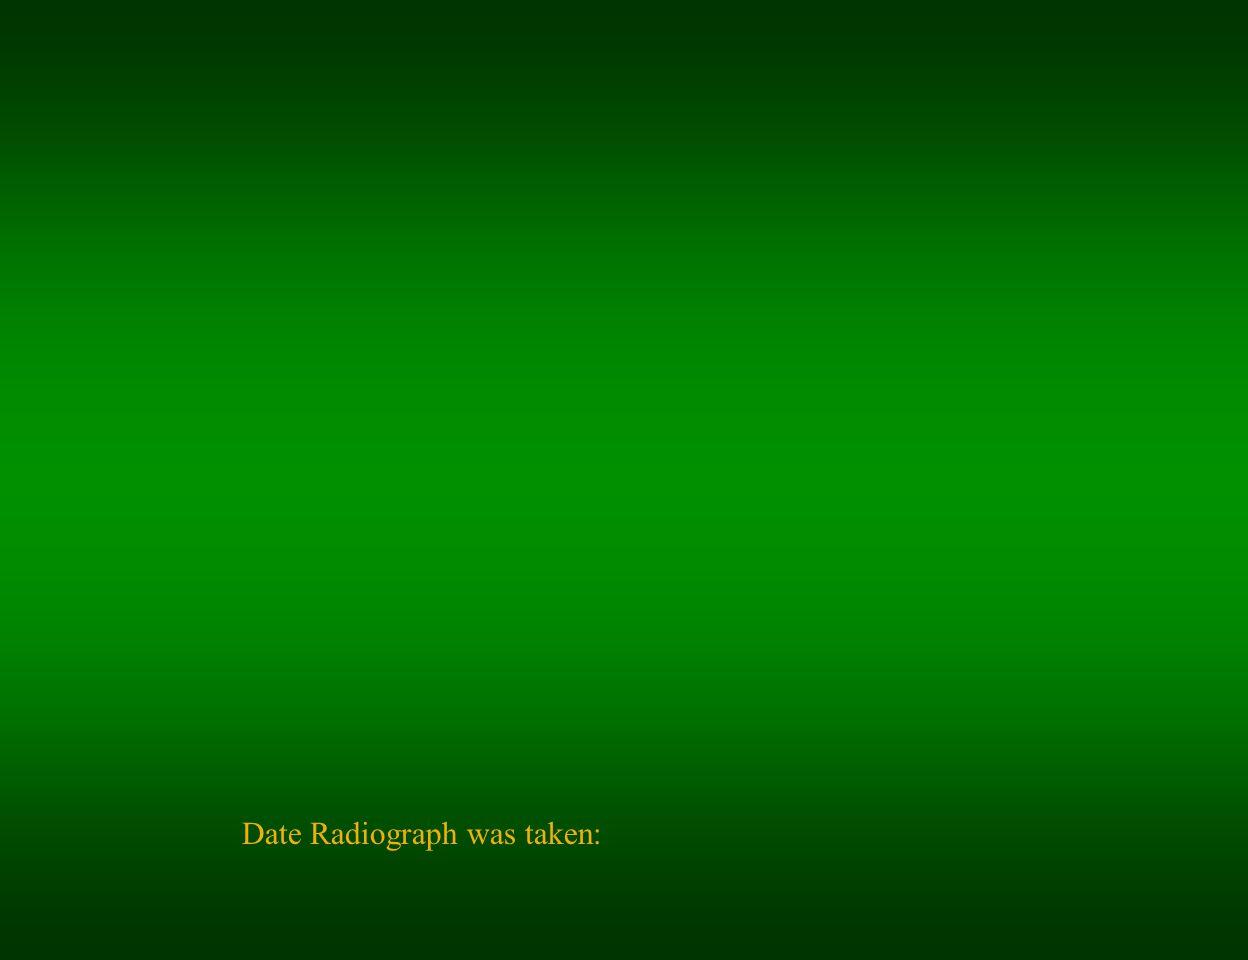 Date Radiograph was taken: